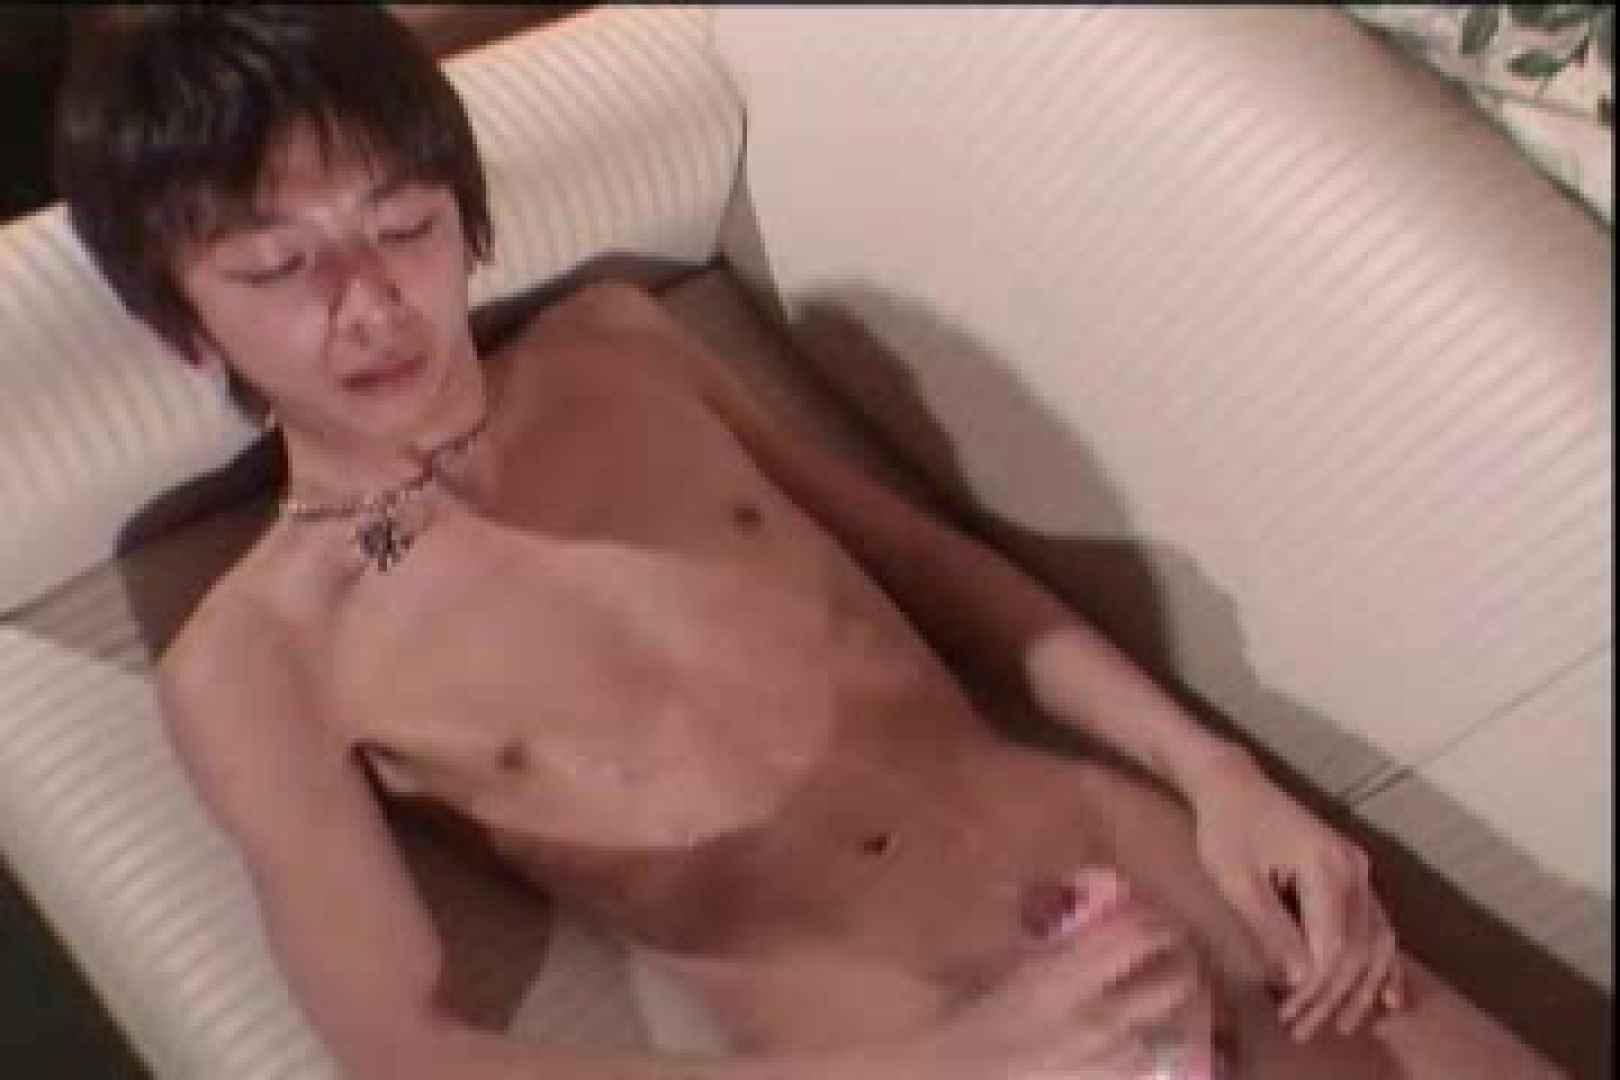 BABY FACEな包茎事情!!4FACEの快楽 フェラ ゲイ素人エロ画像 104枚 18